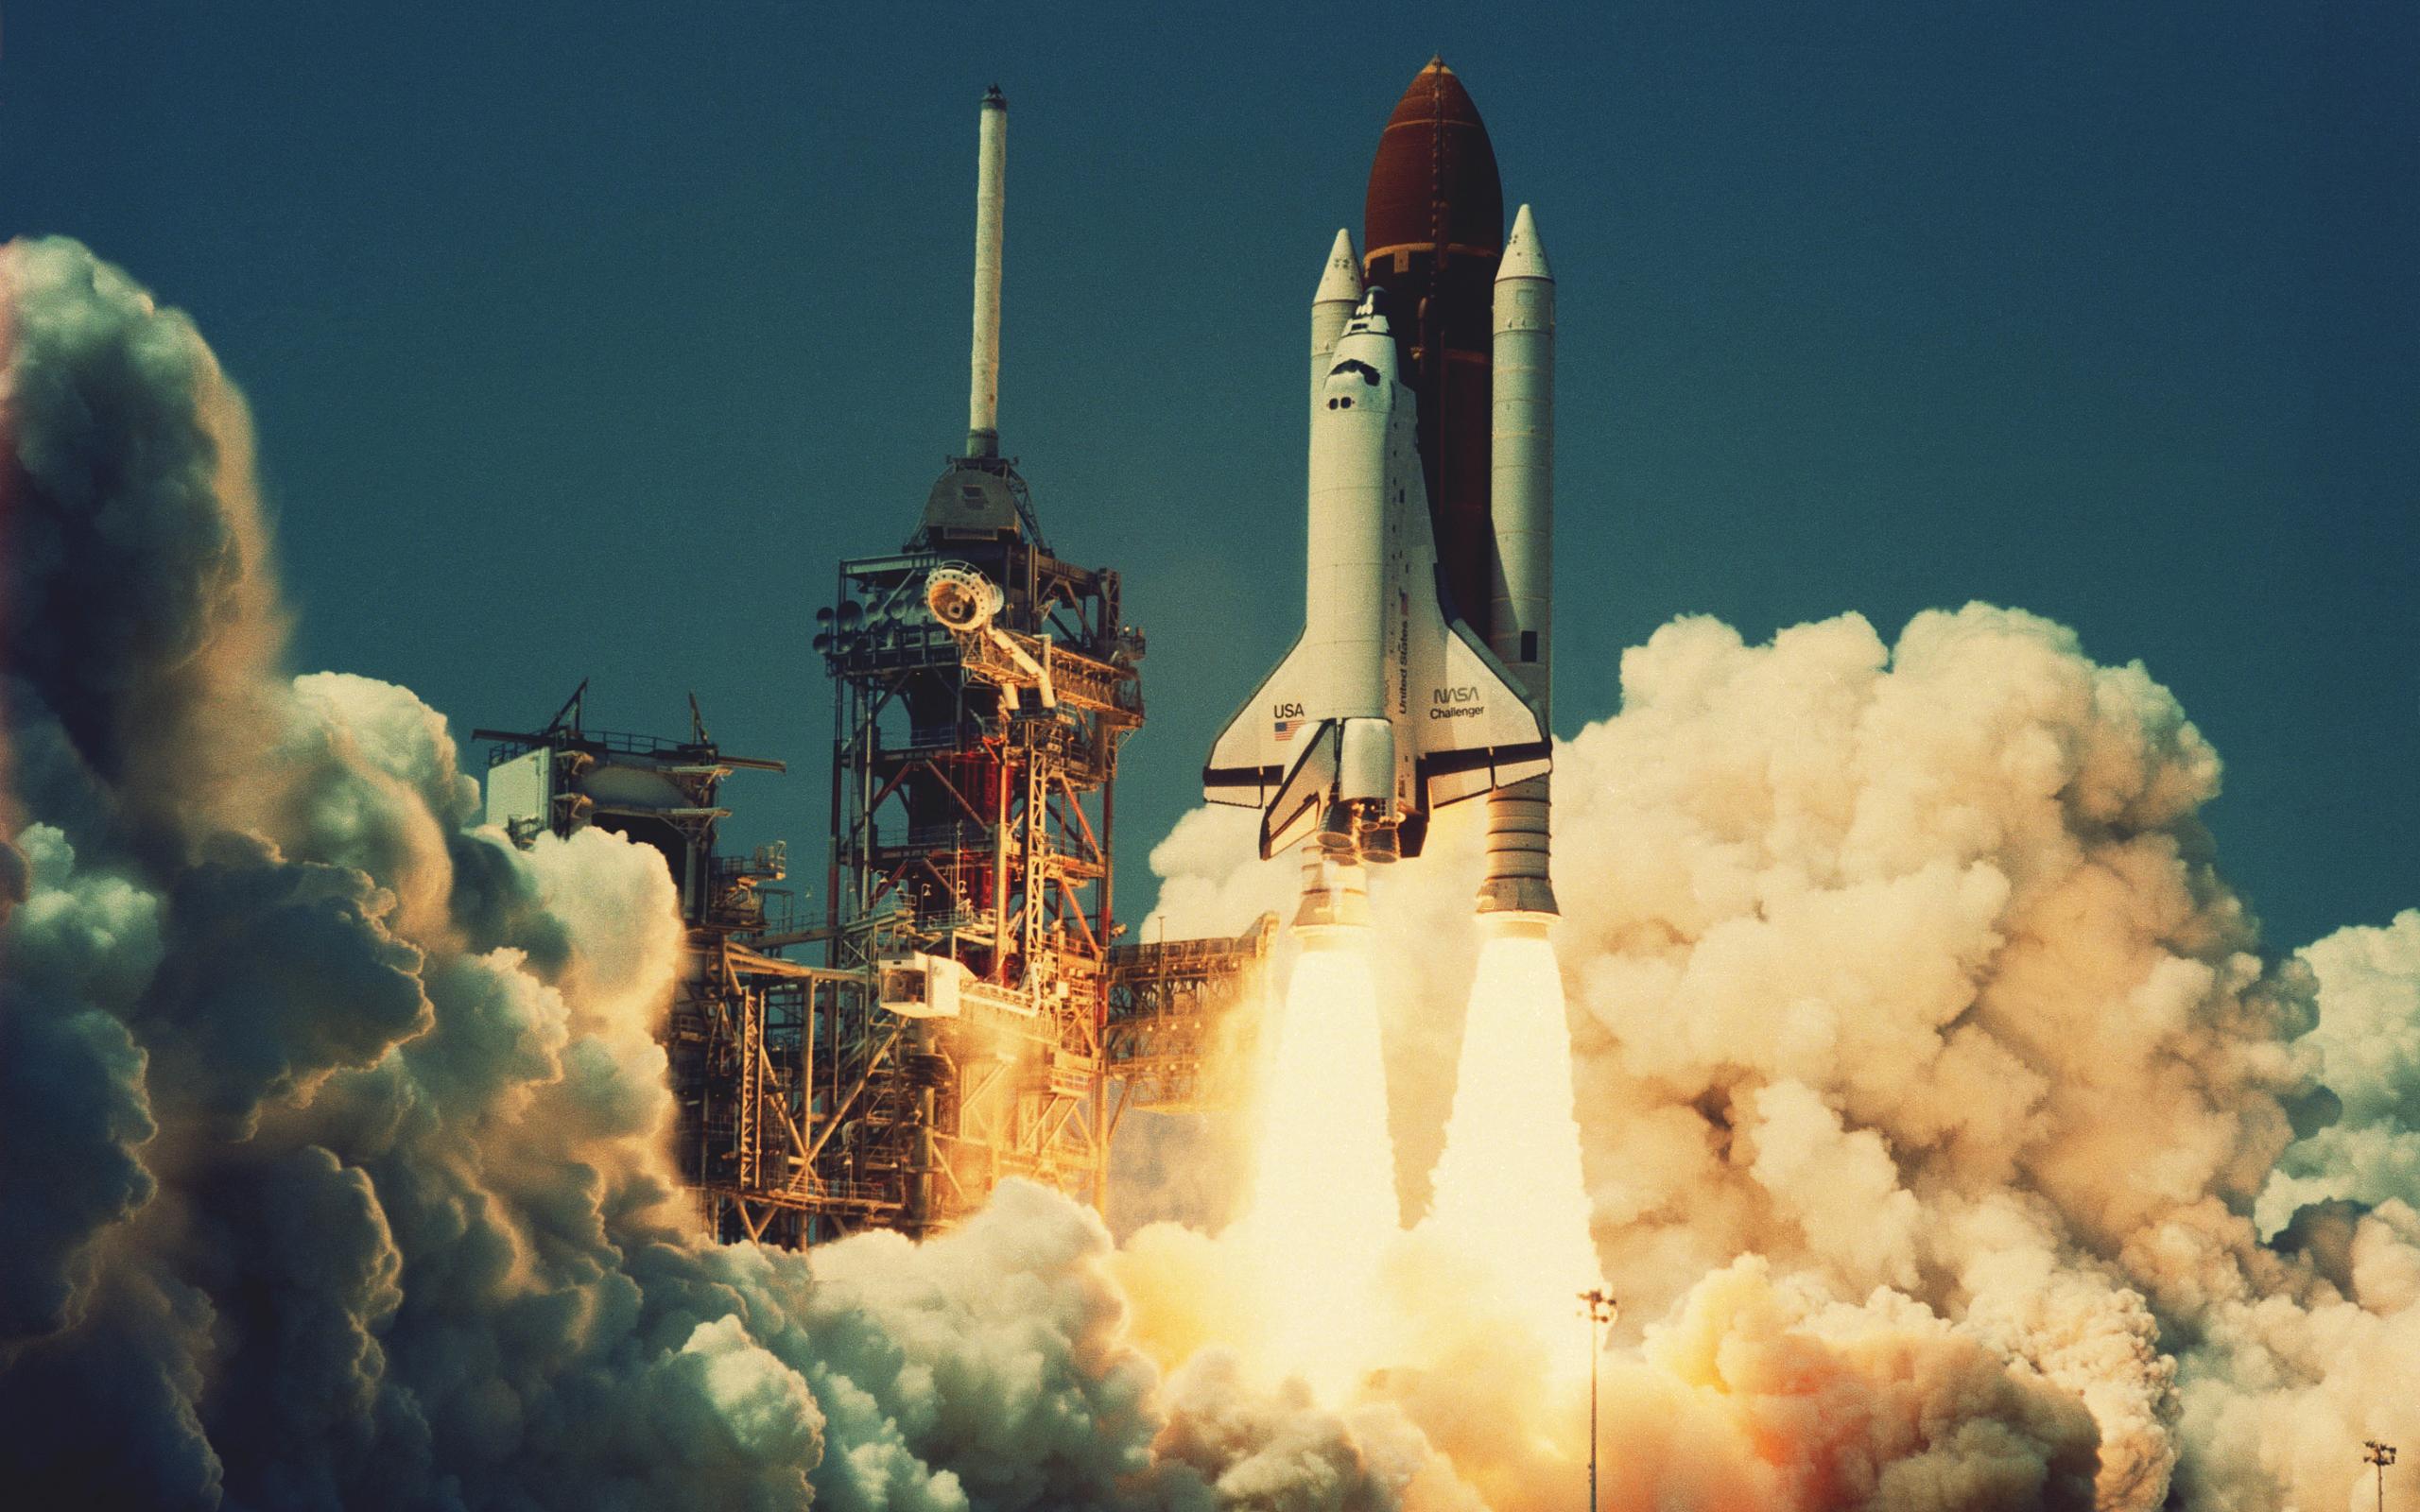 Space Shuttle wallpaper 2560x1600 81972 2560x1600